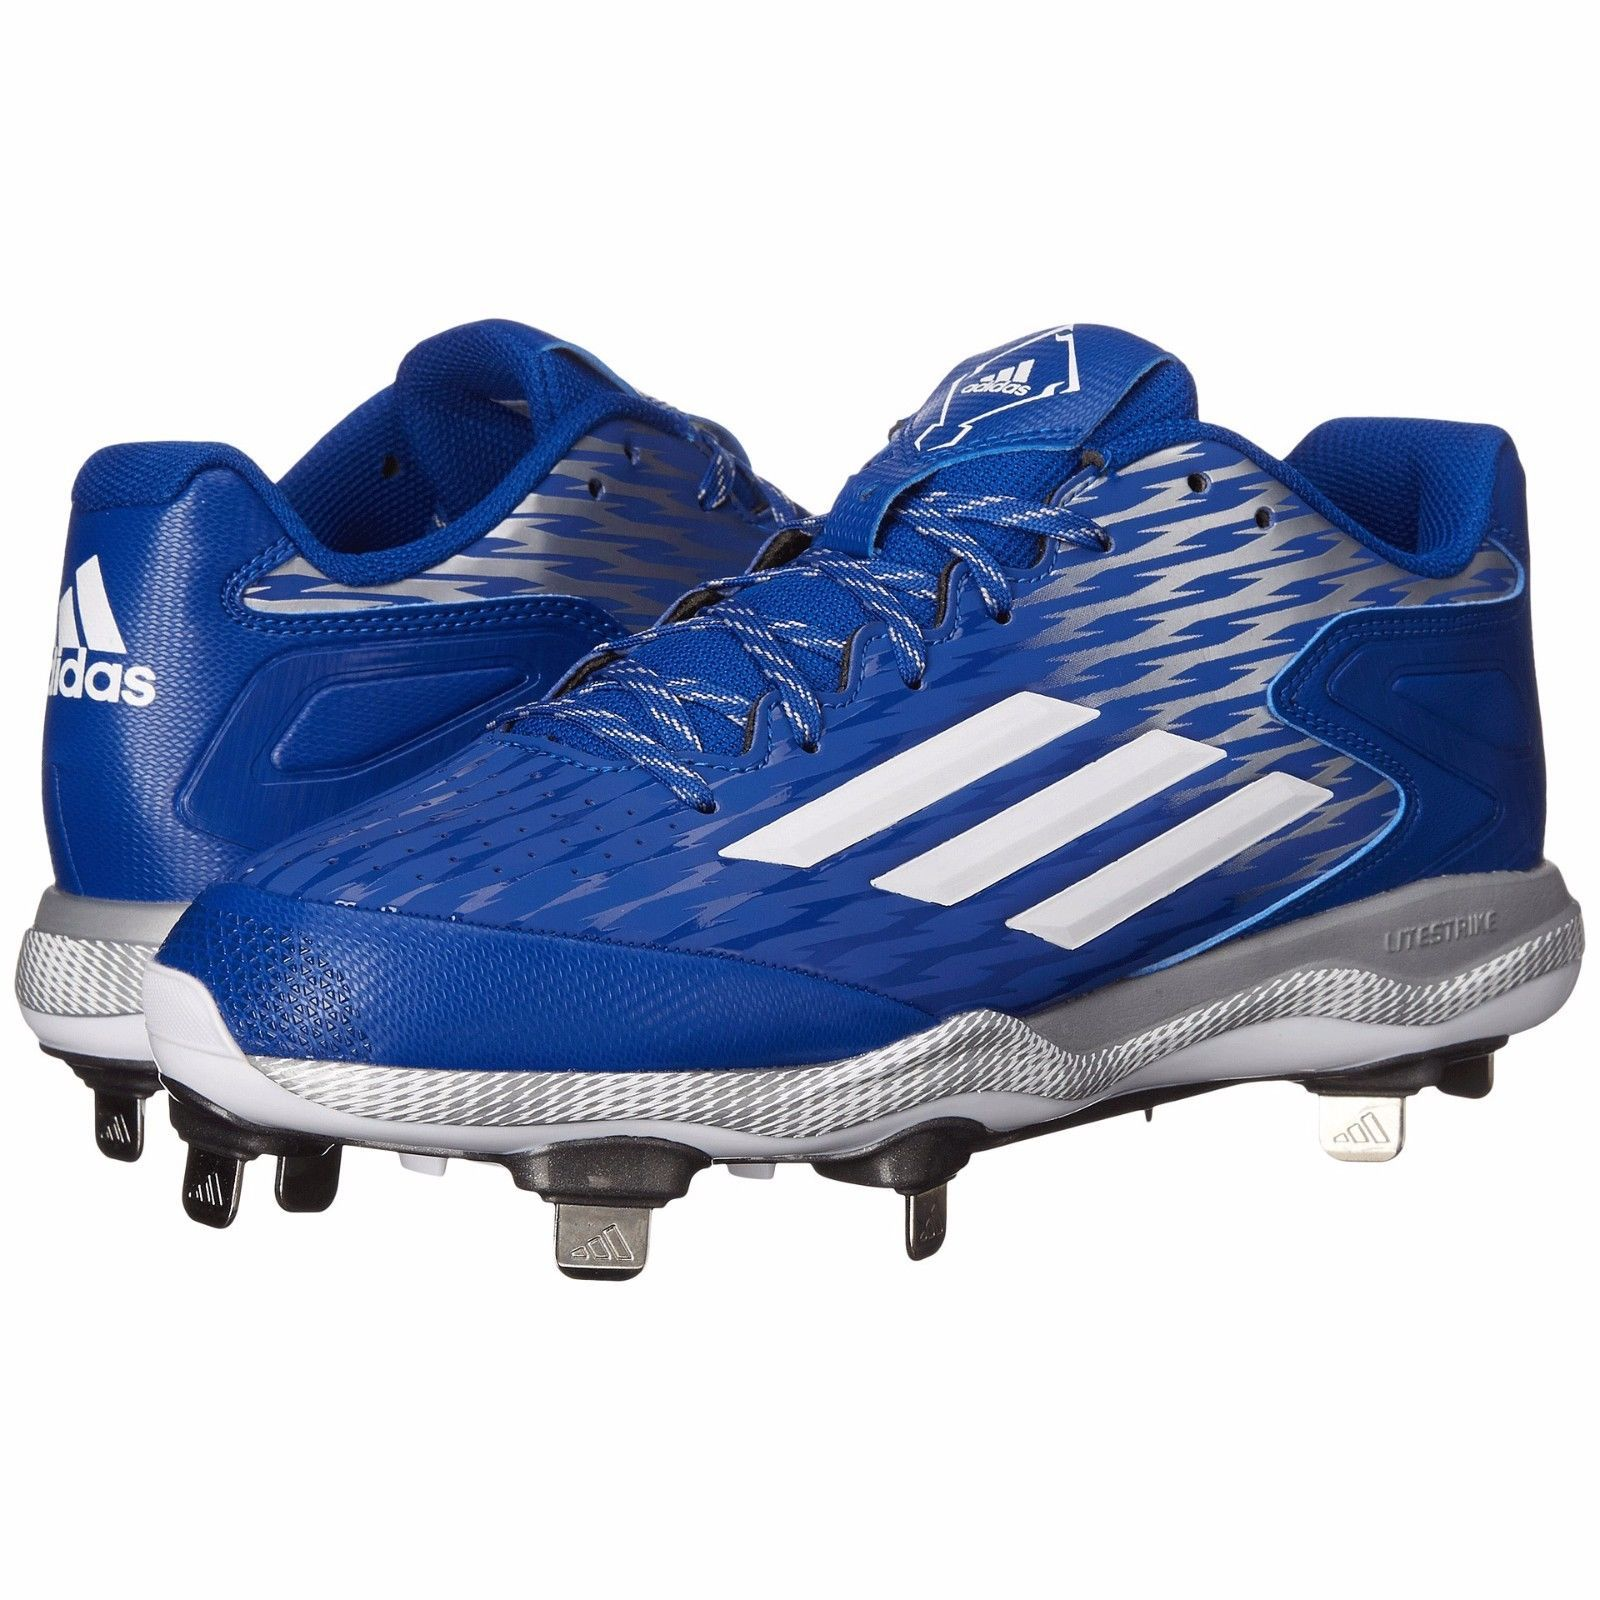 New Adidas Power Alley 3 Metal Mens Baseball Cleats : Royal Blue